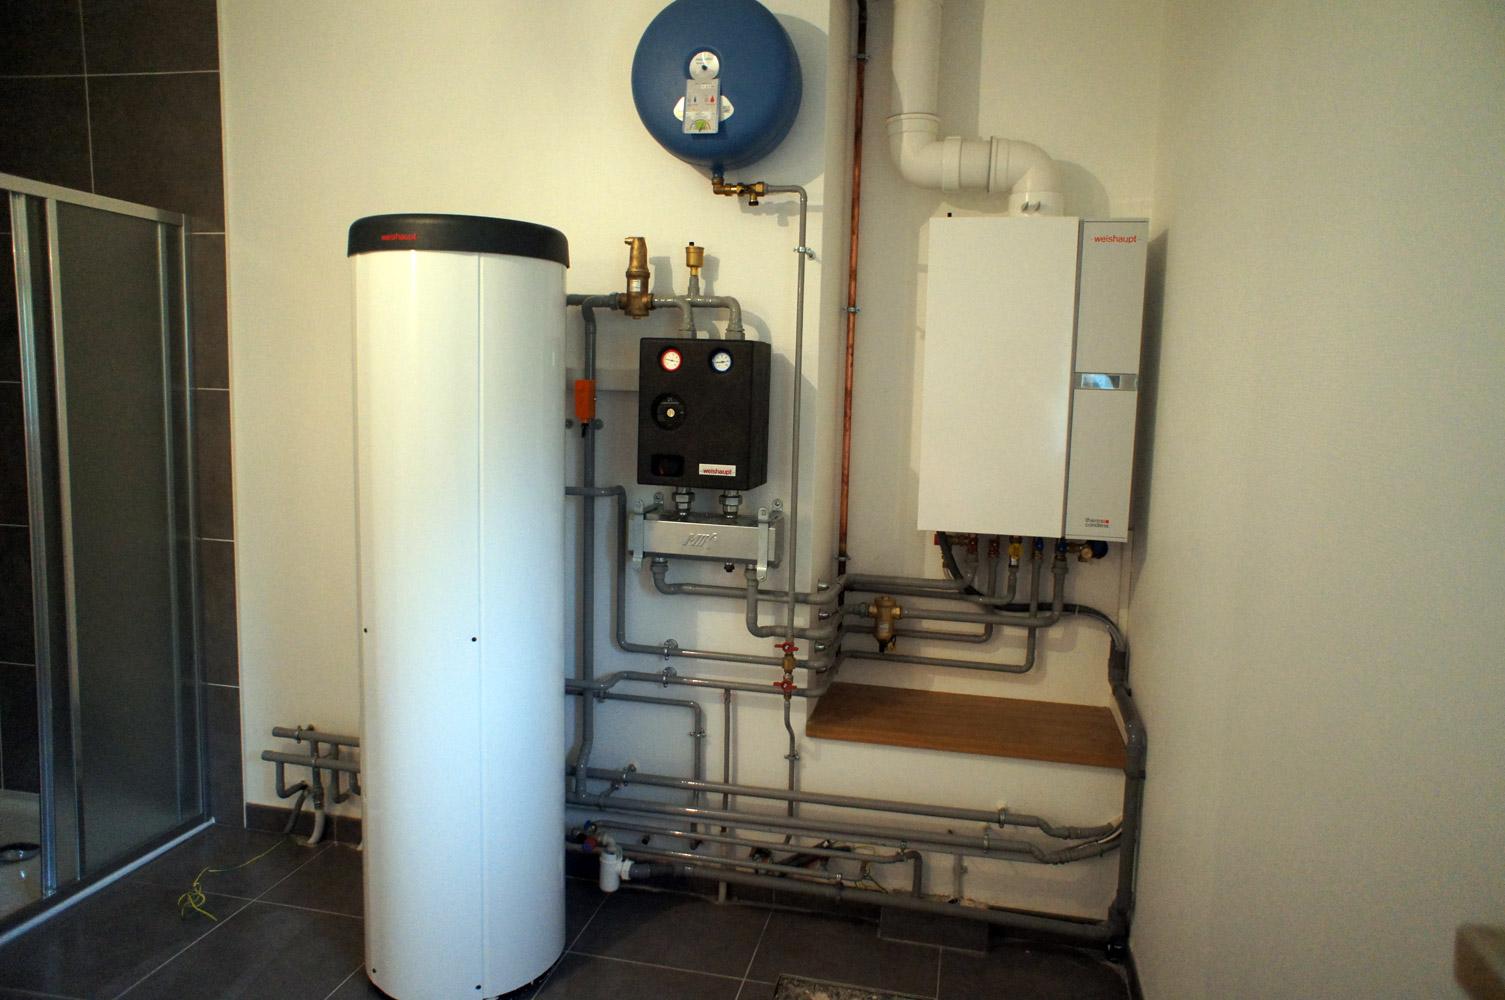 Chaudiere a gaz - Chaudiere gaz condensation prix ...